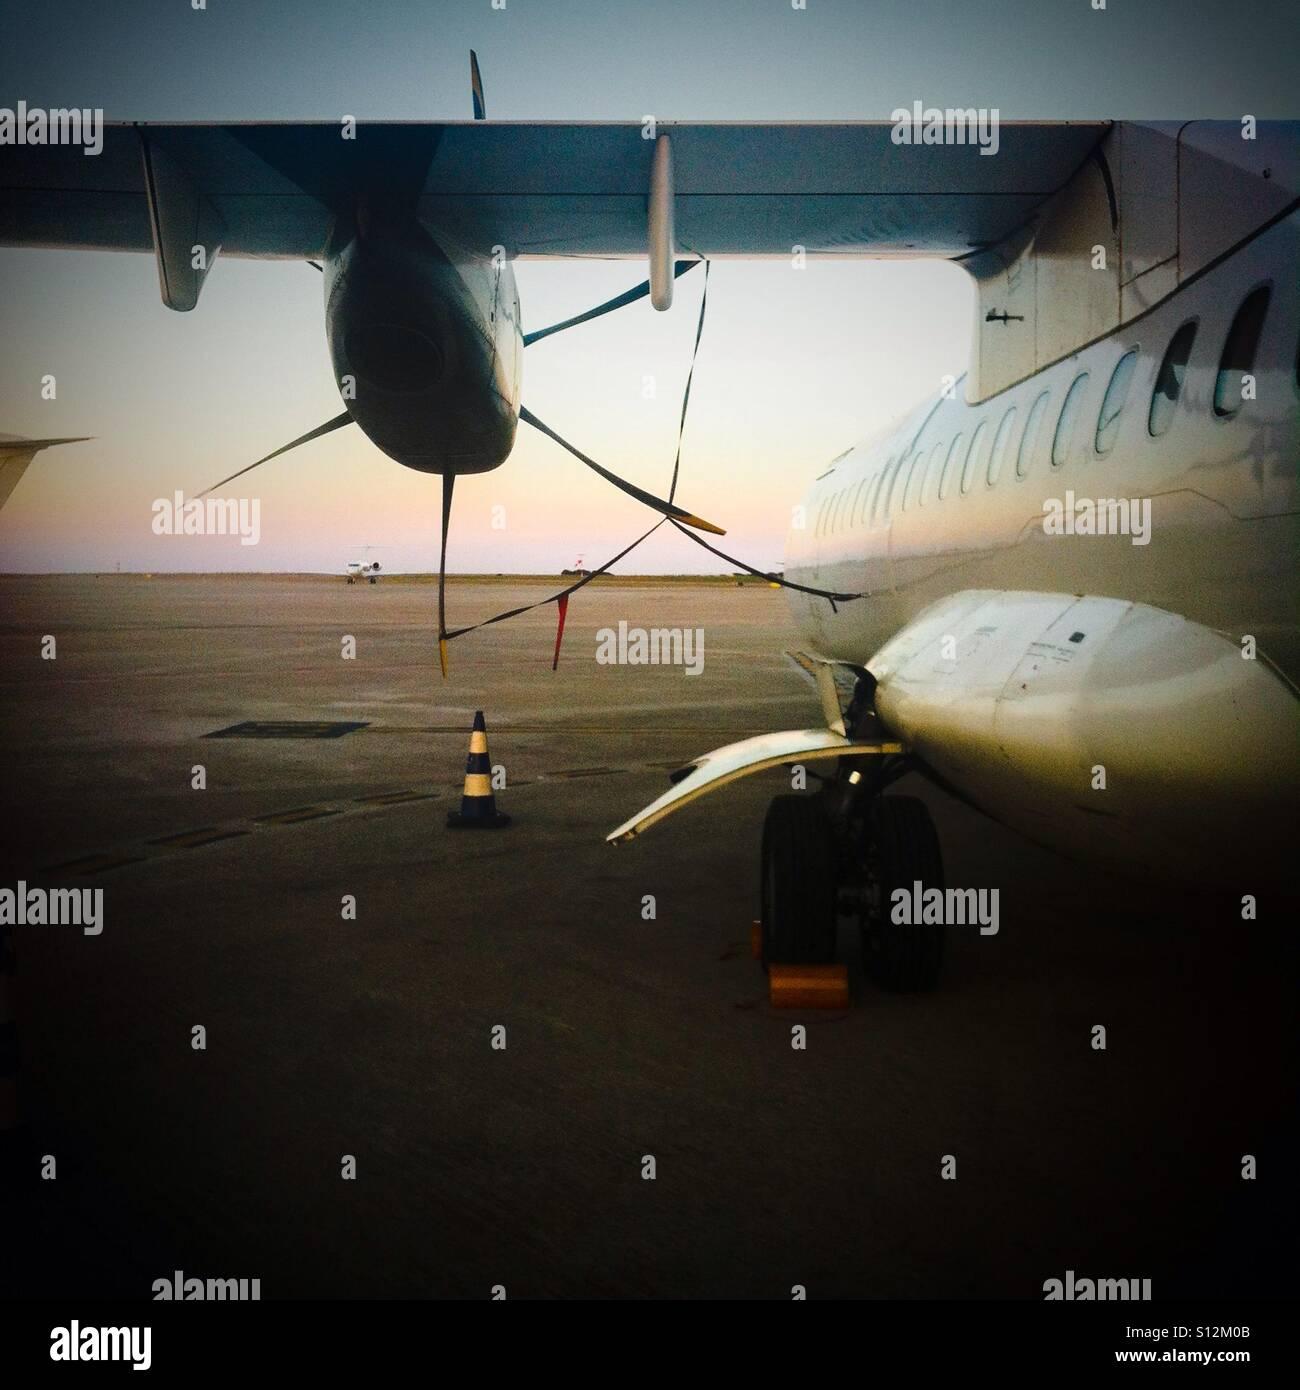 Propeller plane - Stock Image